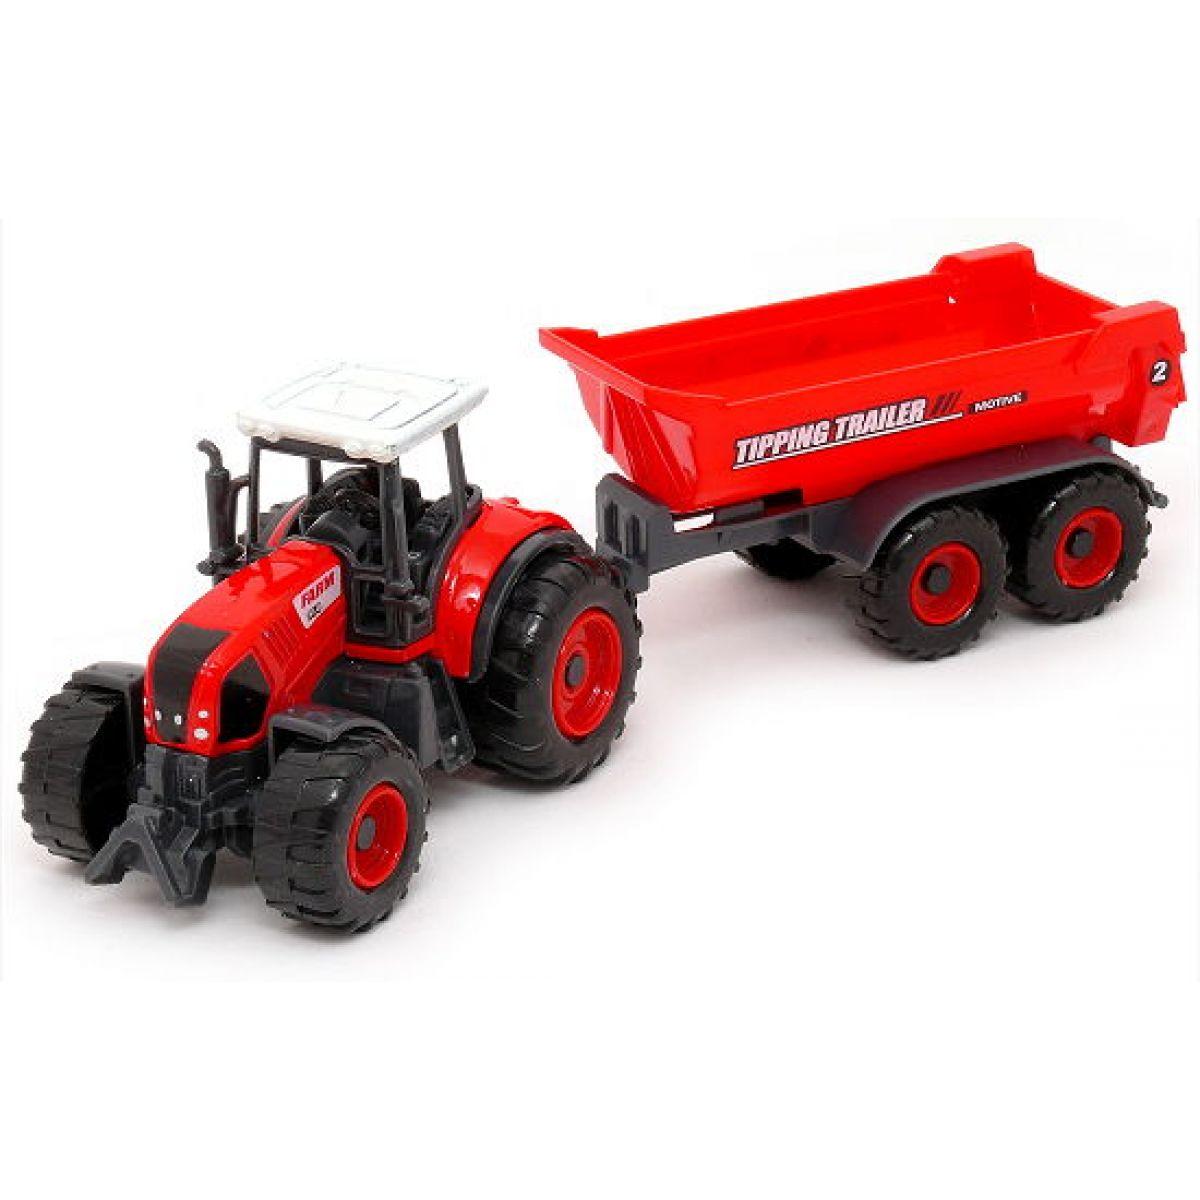 MaDe Traktor s prívesom 27 cm Valník Tipping Trailer